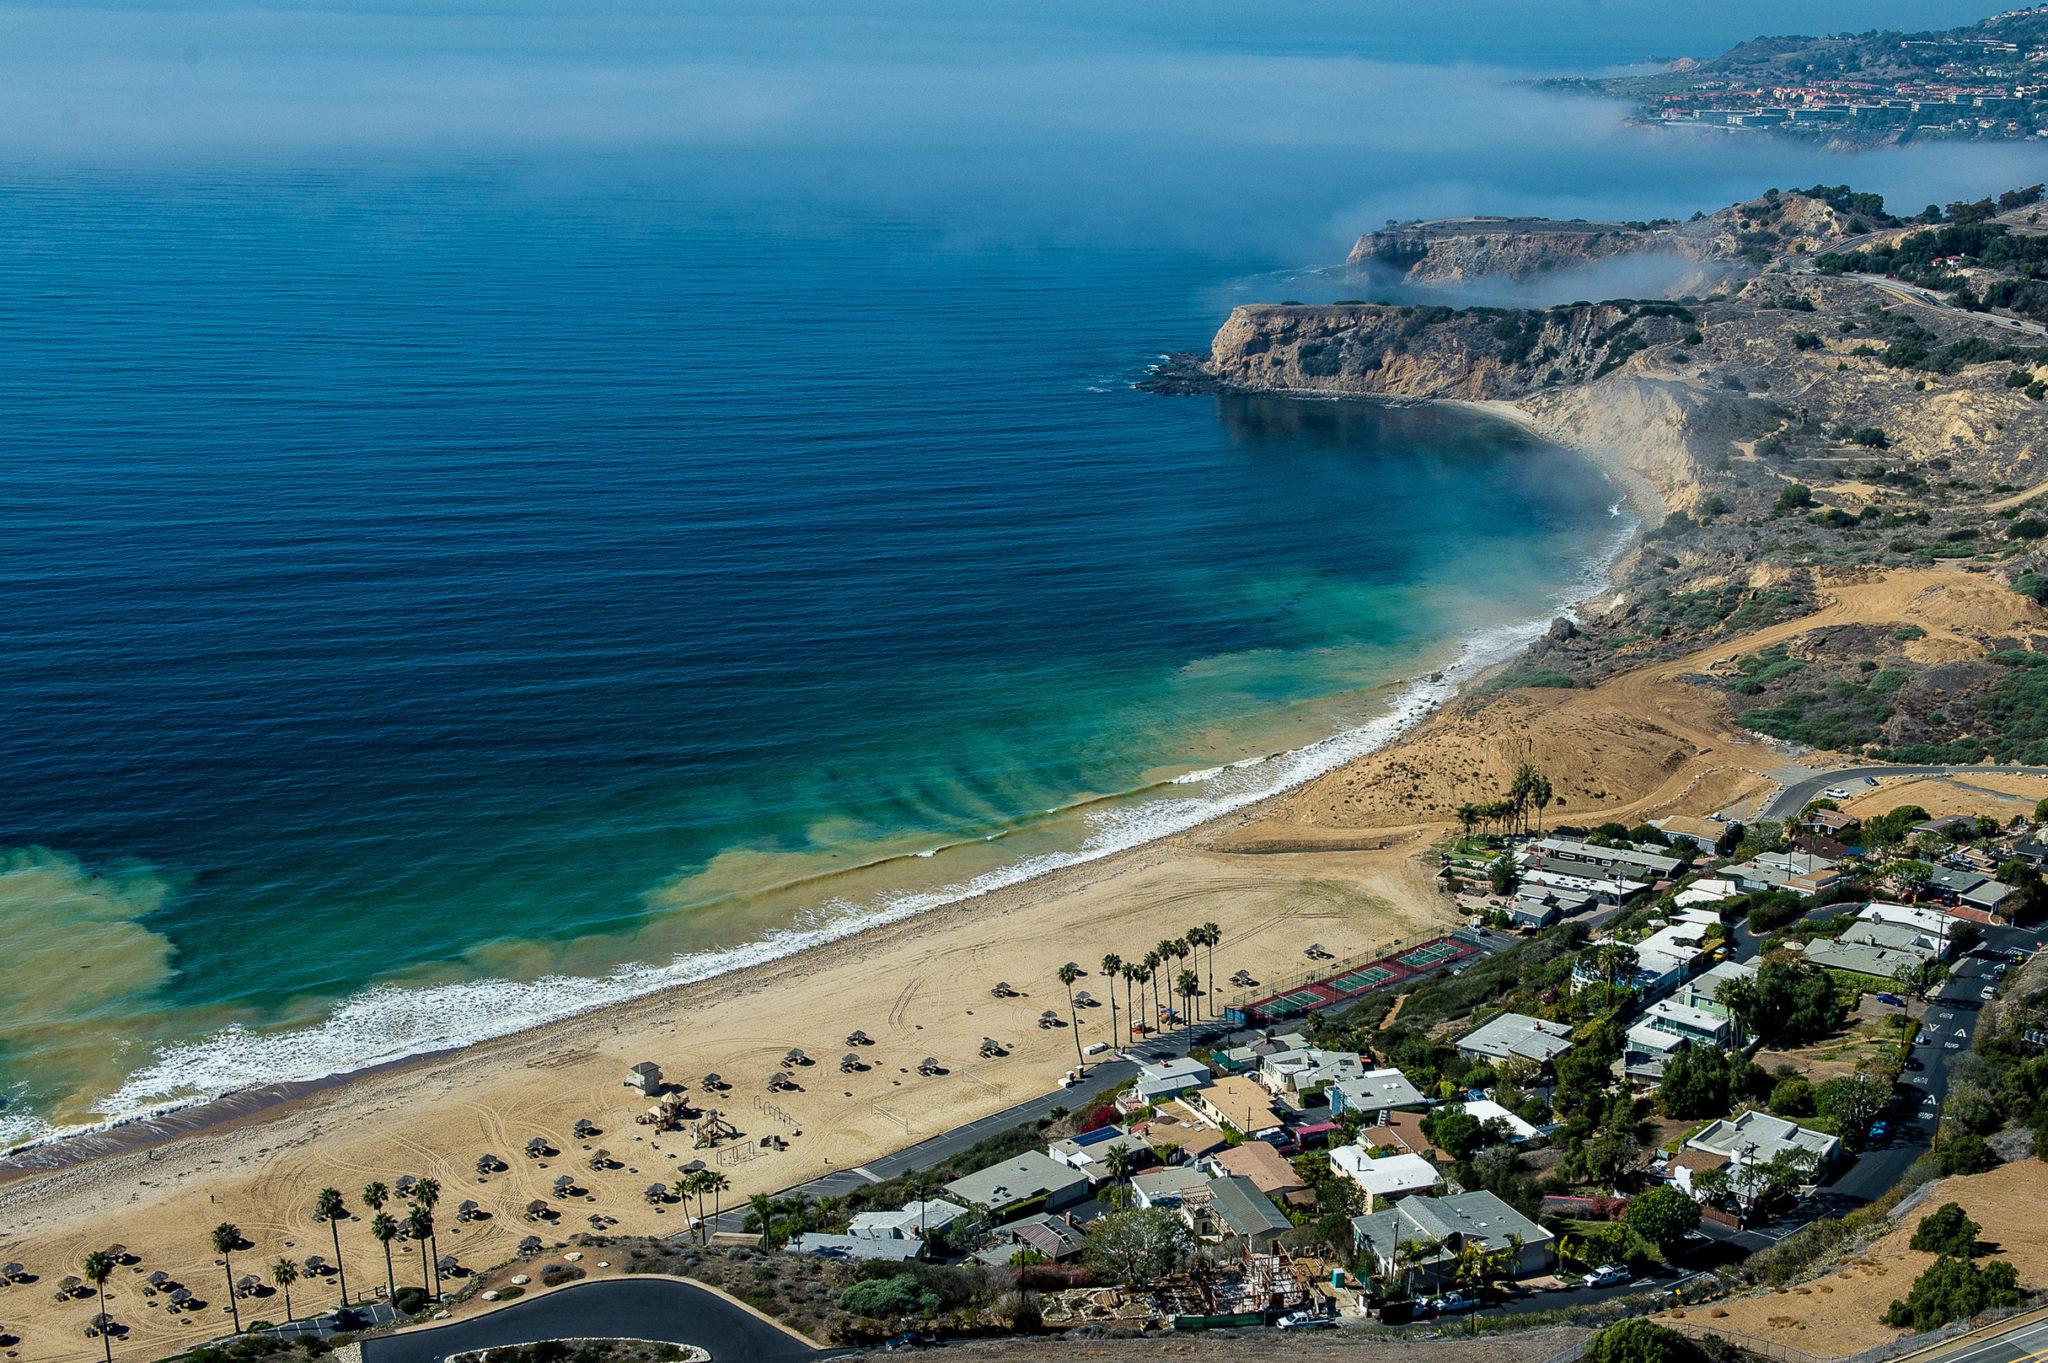 portuguese-bend-beach-club-2.jpg